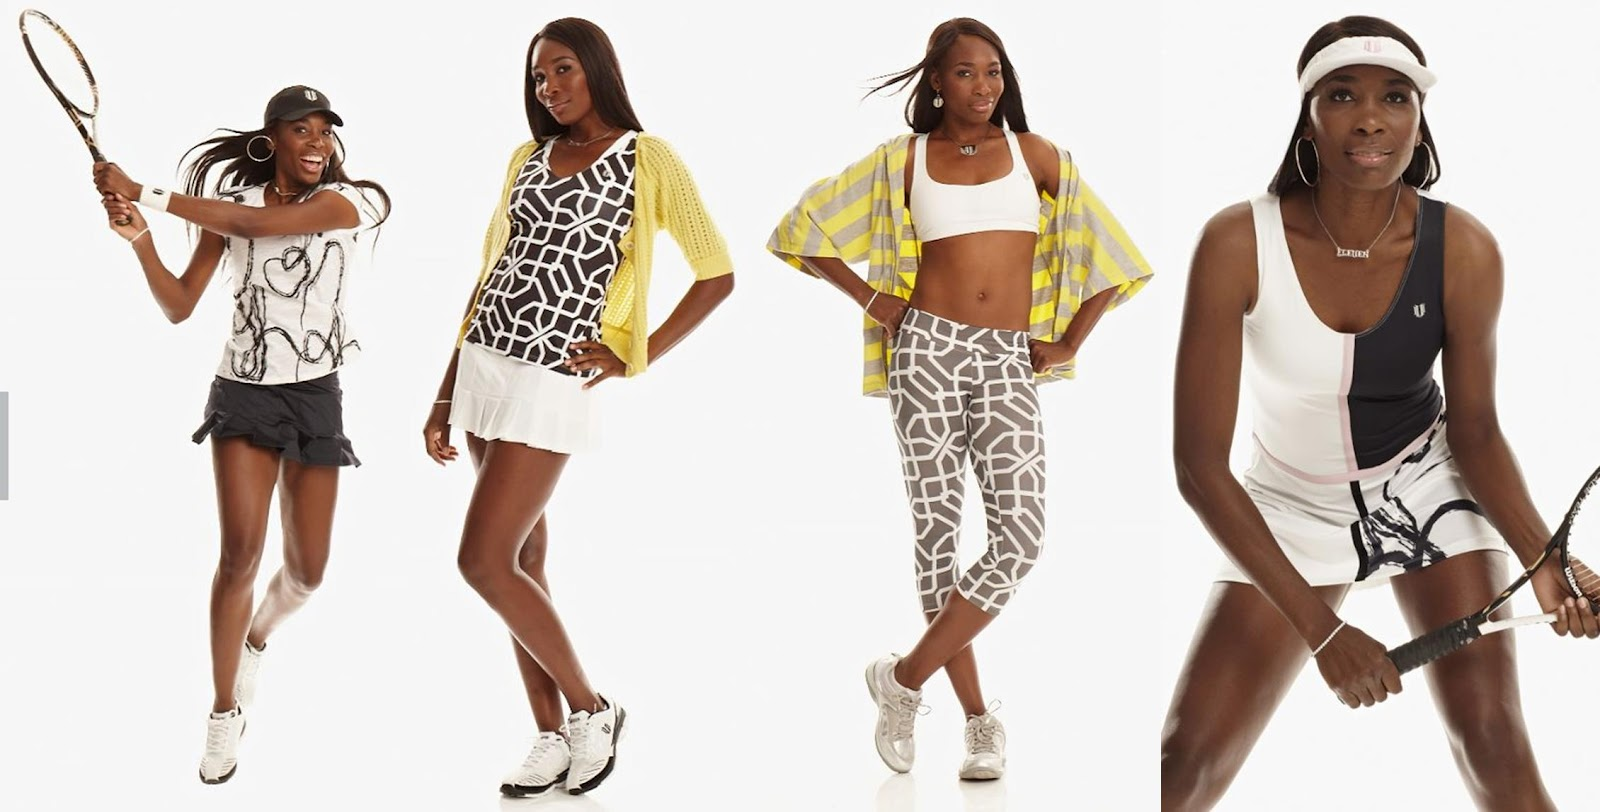 Venus Williams clothing brand